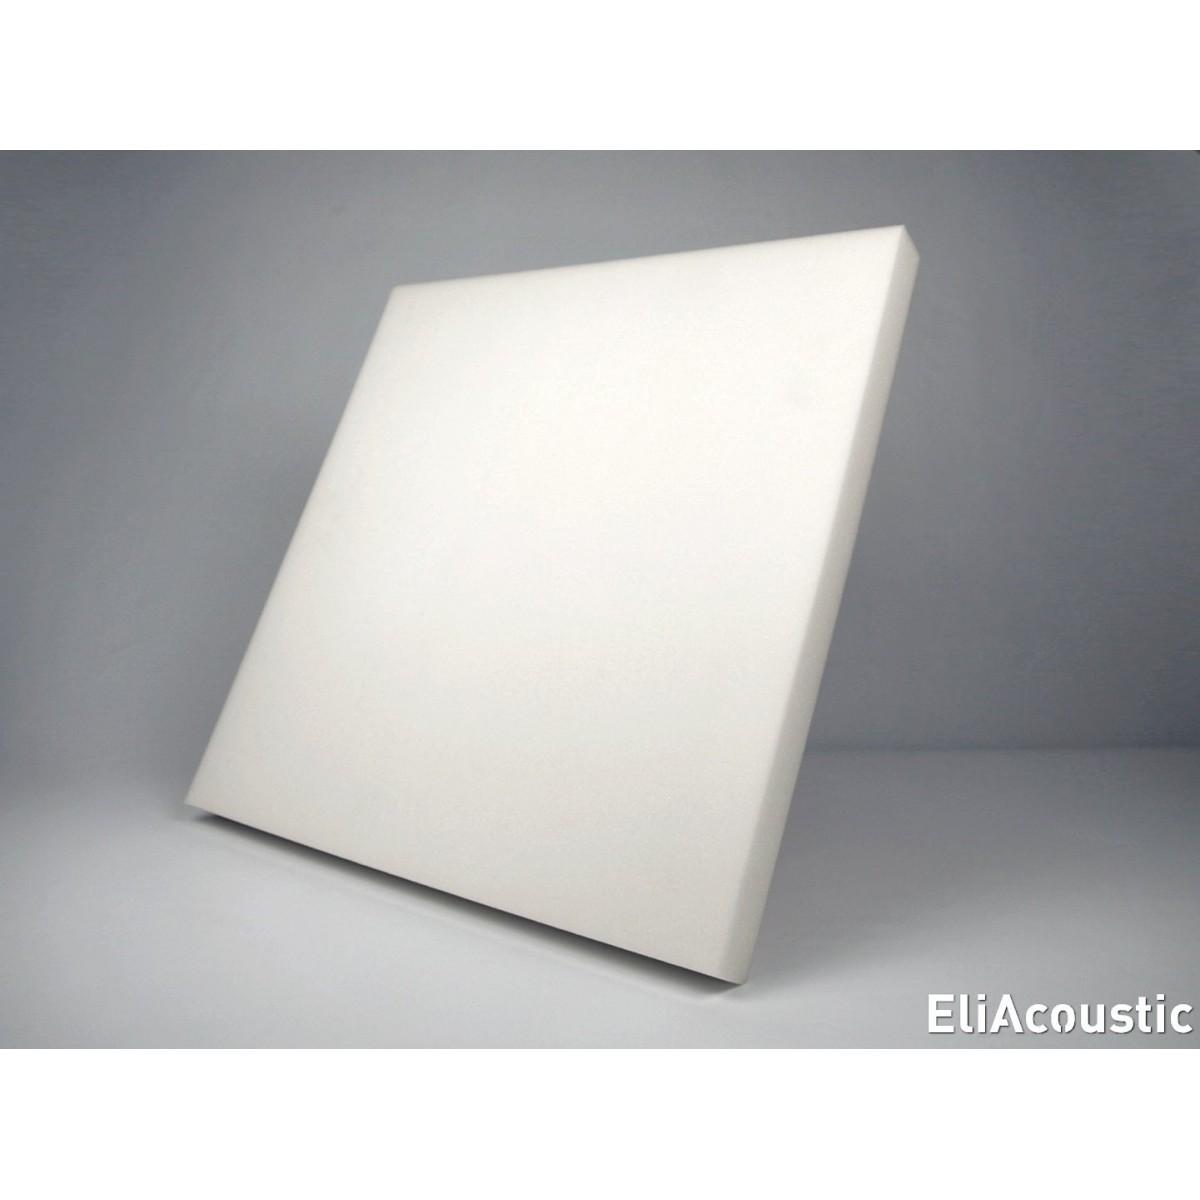 EliAcoustic Regular 60.4 First-White. Panel Acustico liso de espuma acustica blanca